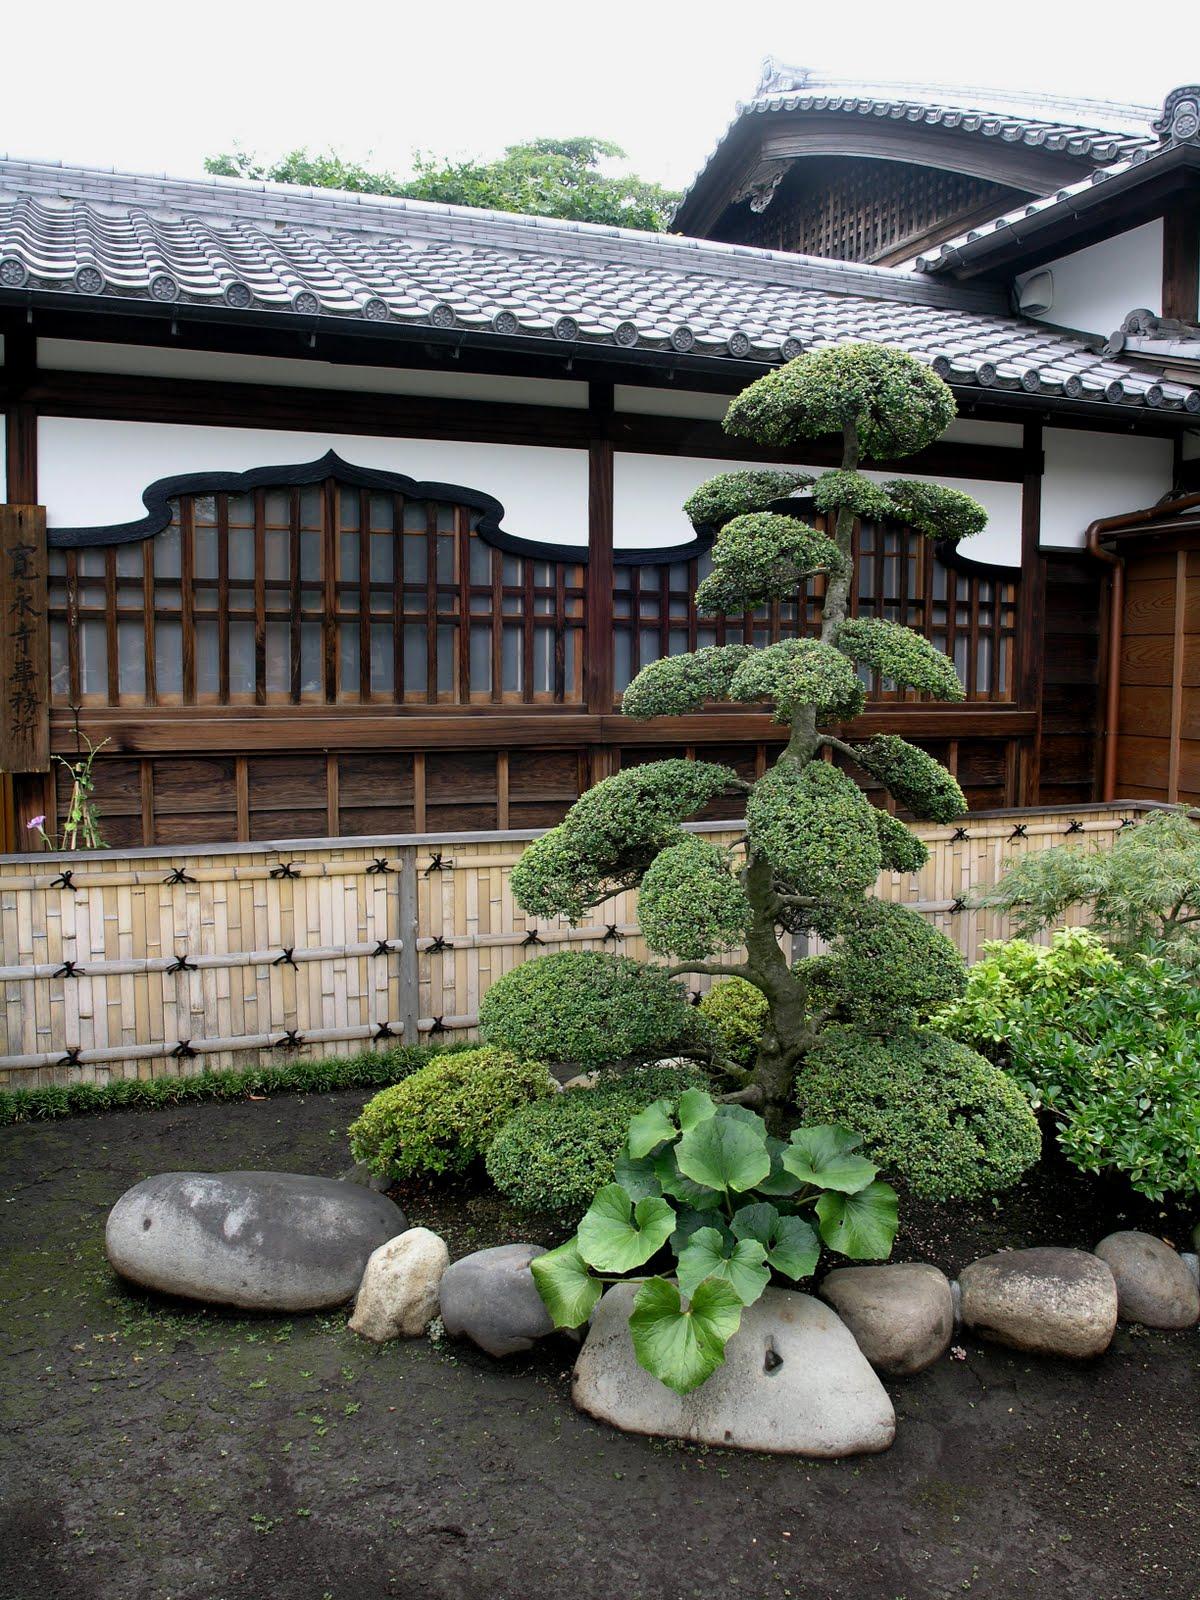 Planeta dunia mayo 2011 for Arboles para jardin japones